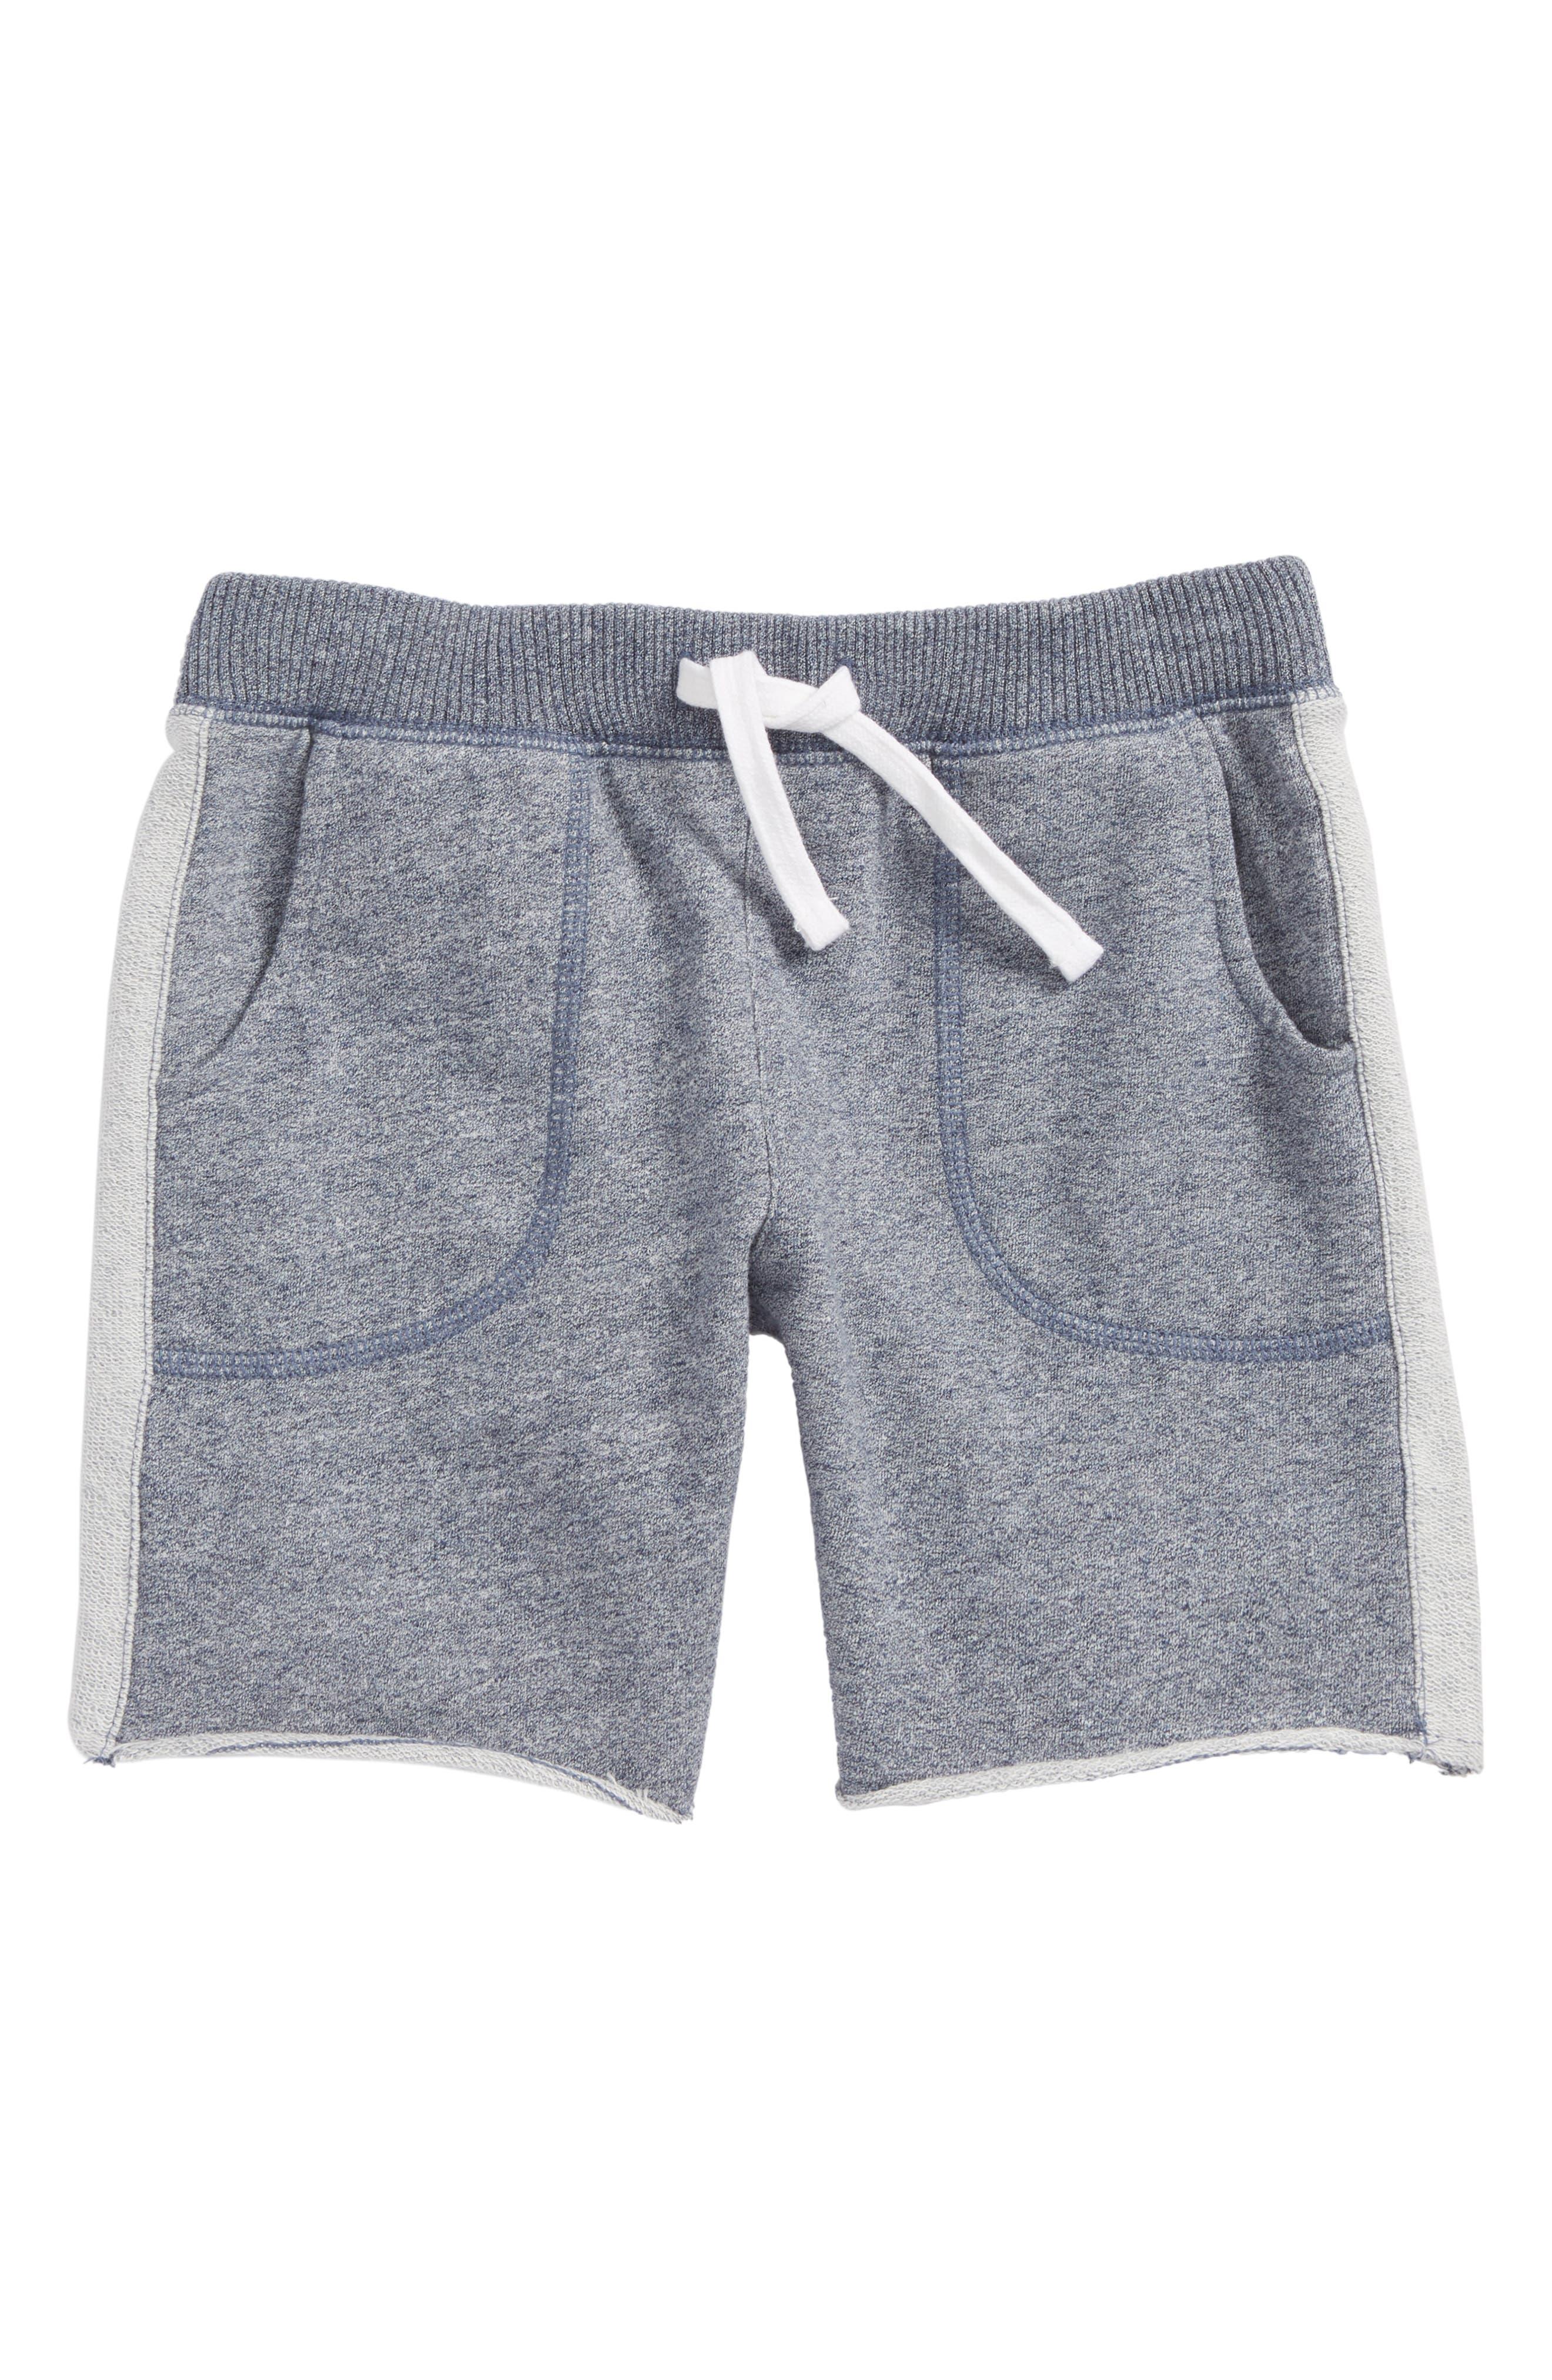 Fleece Shorts,                         Main,                         color, Navy Denim